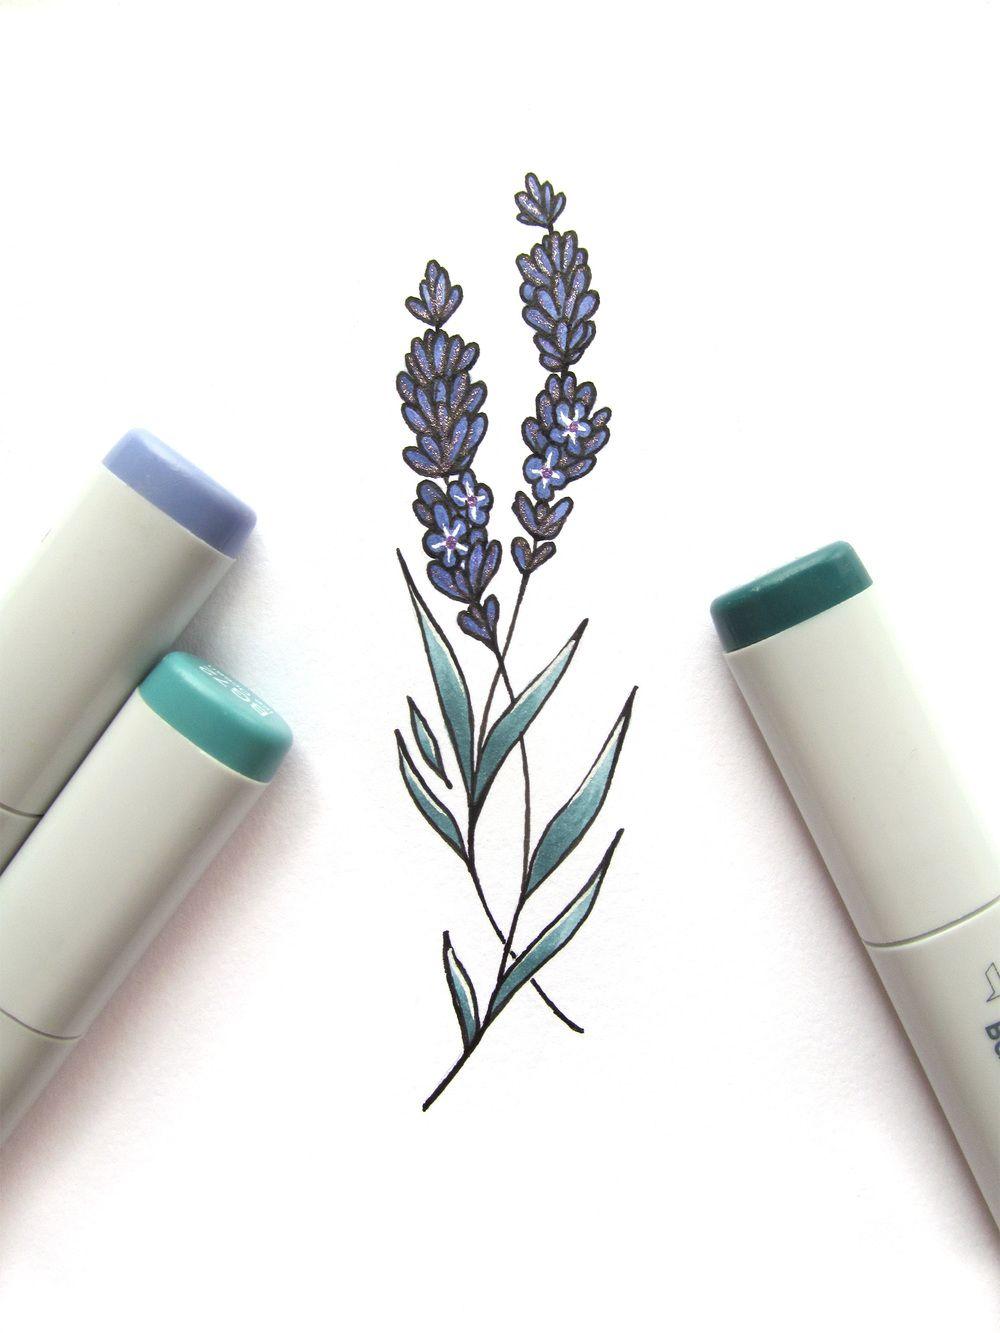 Simple-Lavender-Plant-Tattoo-Design.jpg (764×764) | tattoo ... |Lavender Tattoo Outline